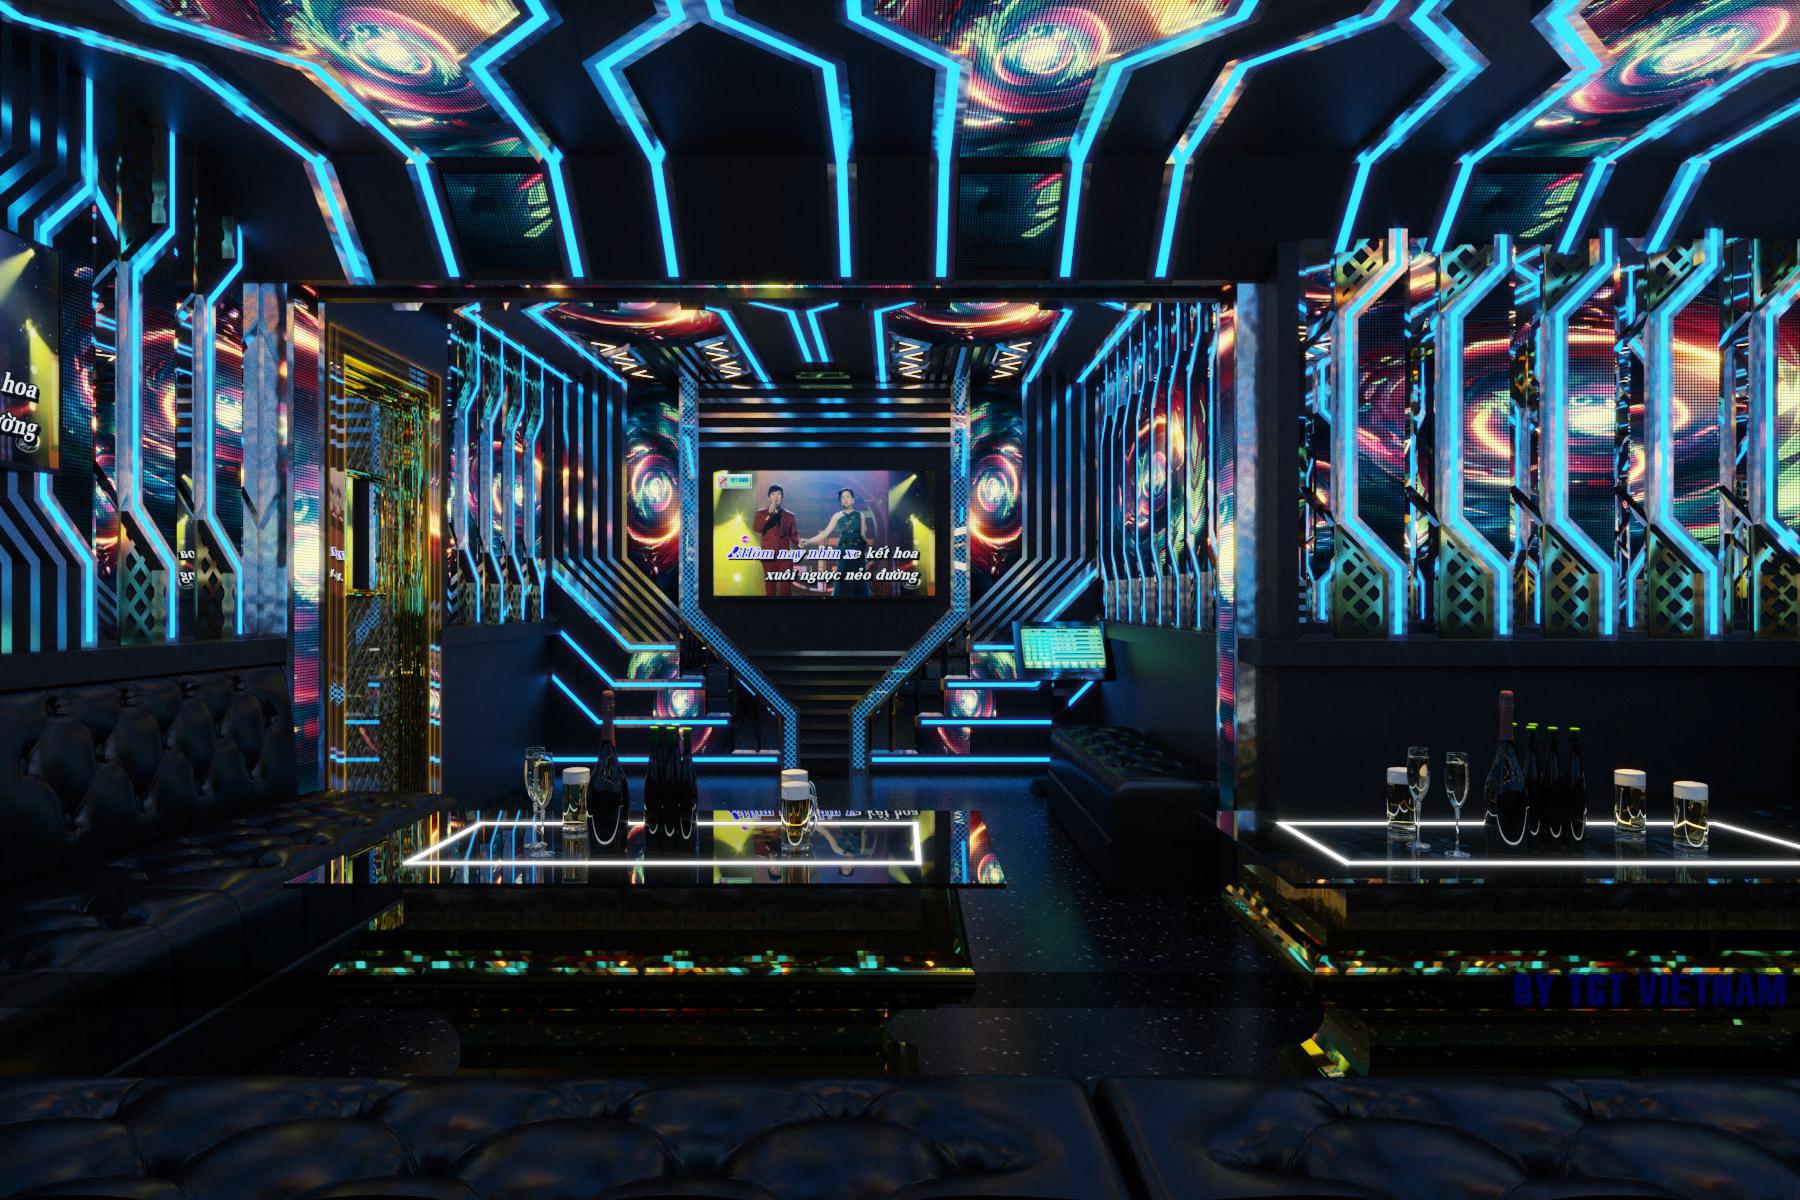 Mẫu thiết kế 3D của Nội thất Karaoke Pro